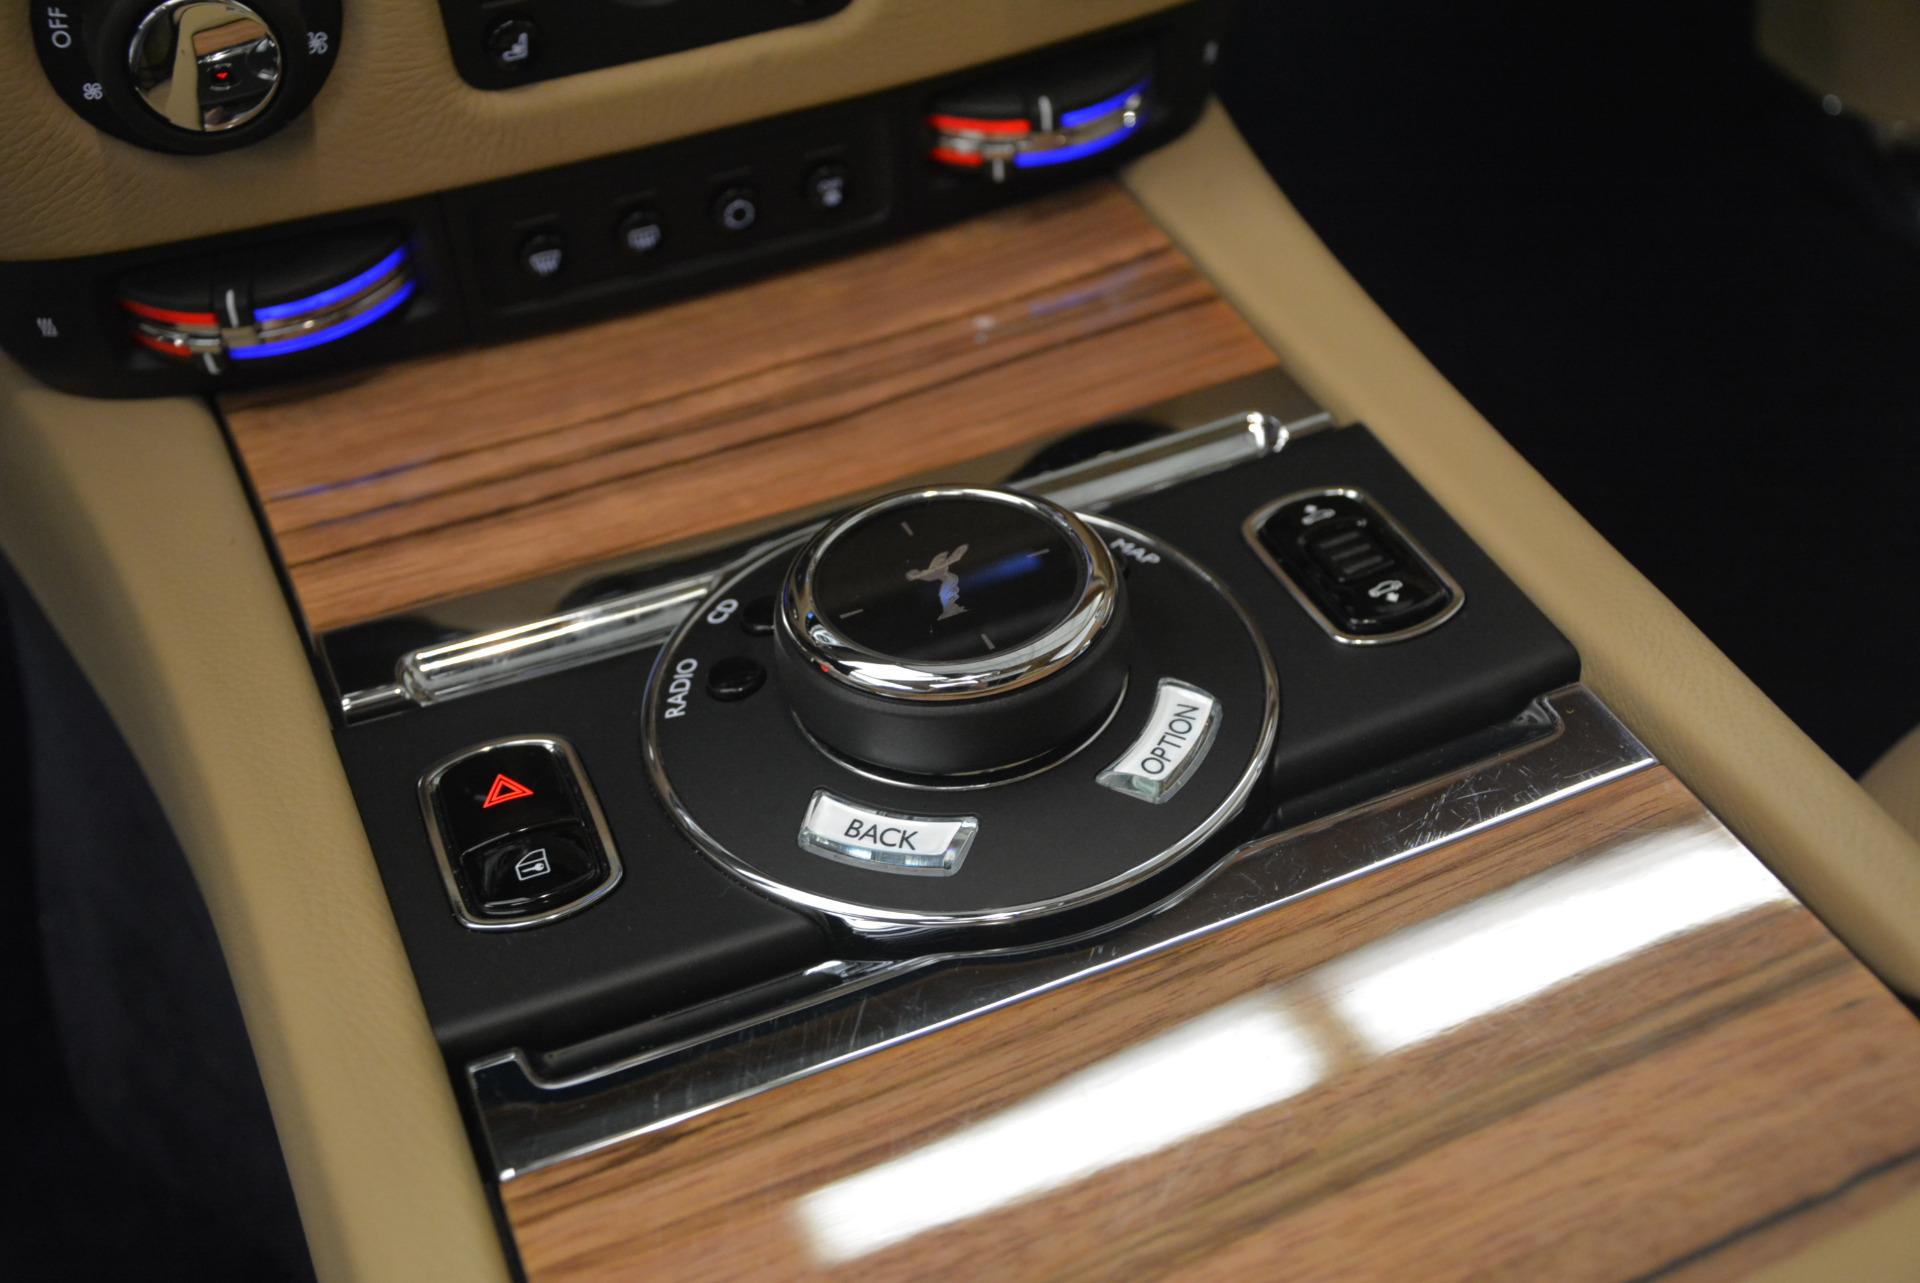 Used 2014 Rolls-Royce Ghost V-Spec For Sale In Westport, CT 858_p24